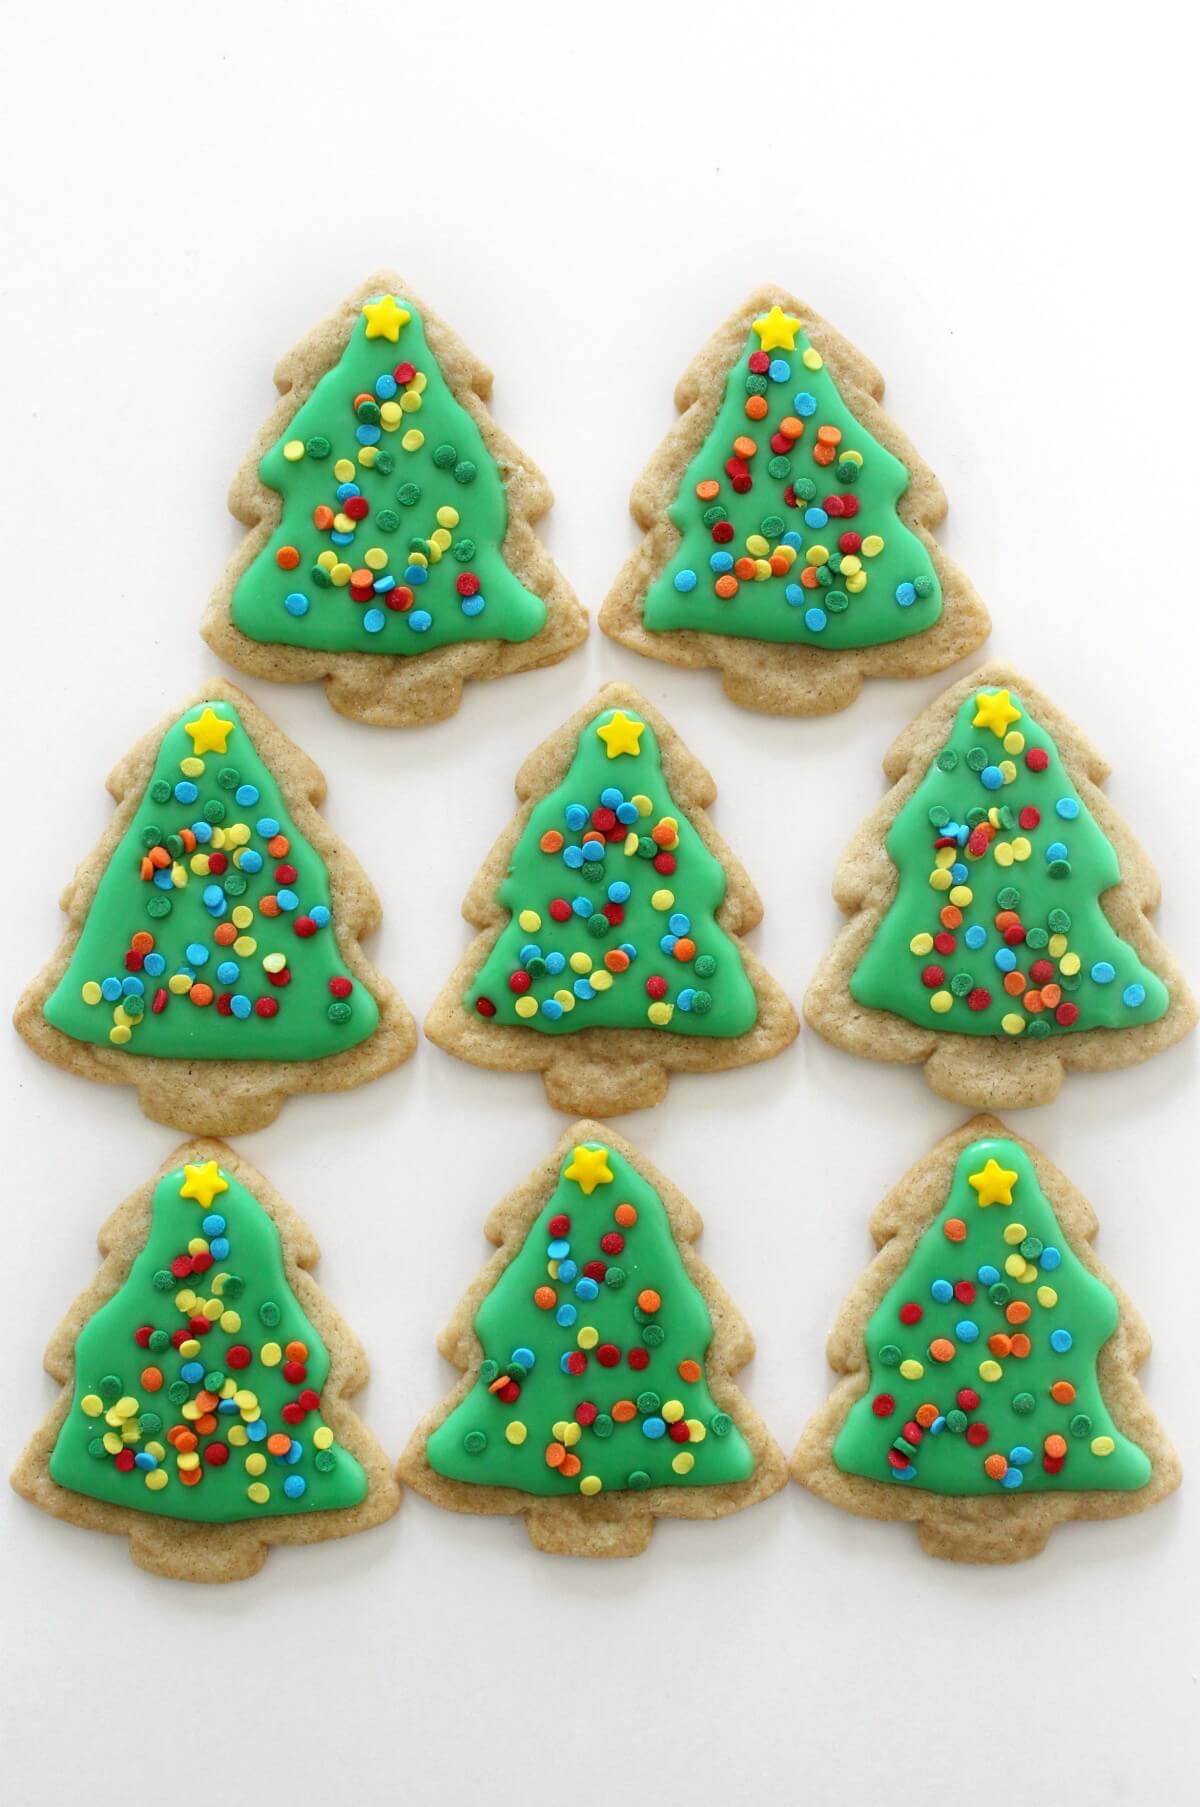 decorated gluten-free christmas tree sugar cookies